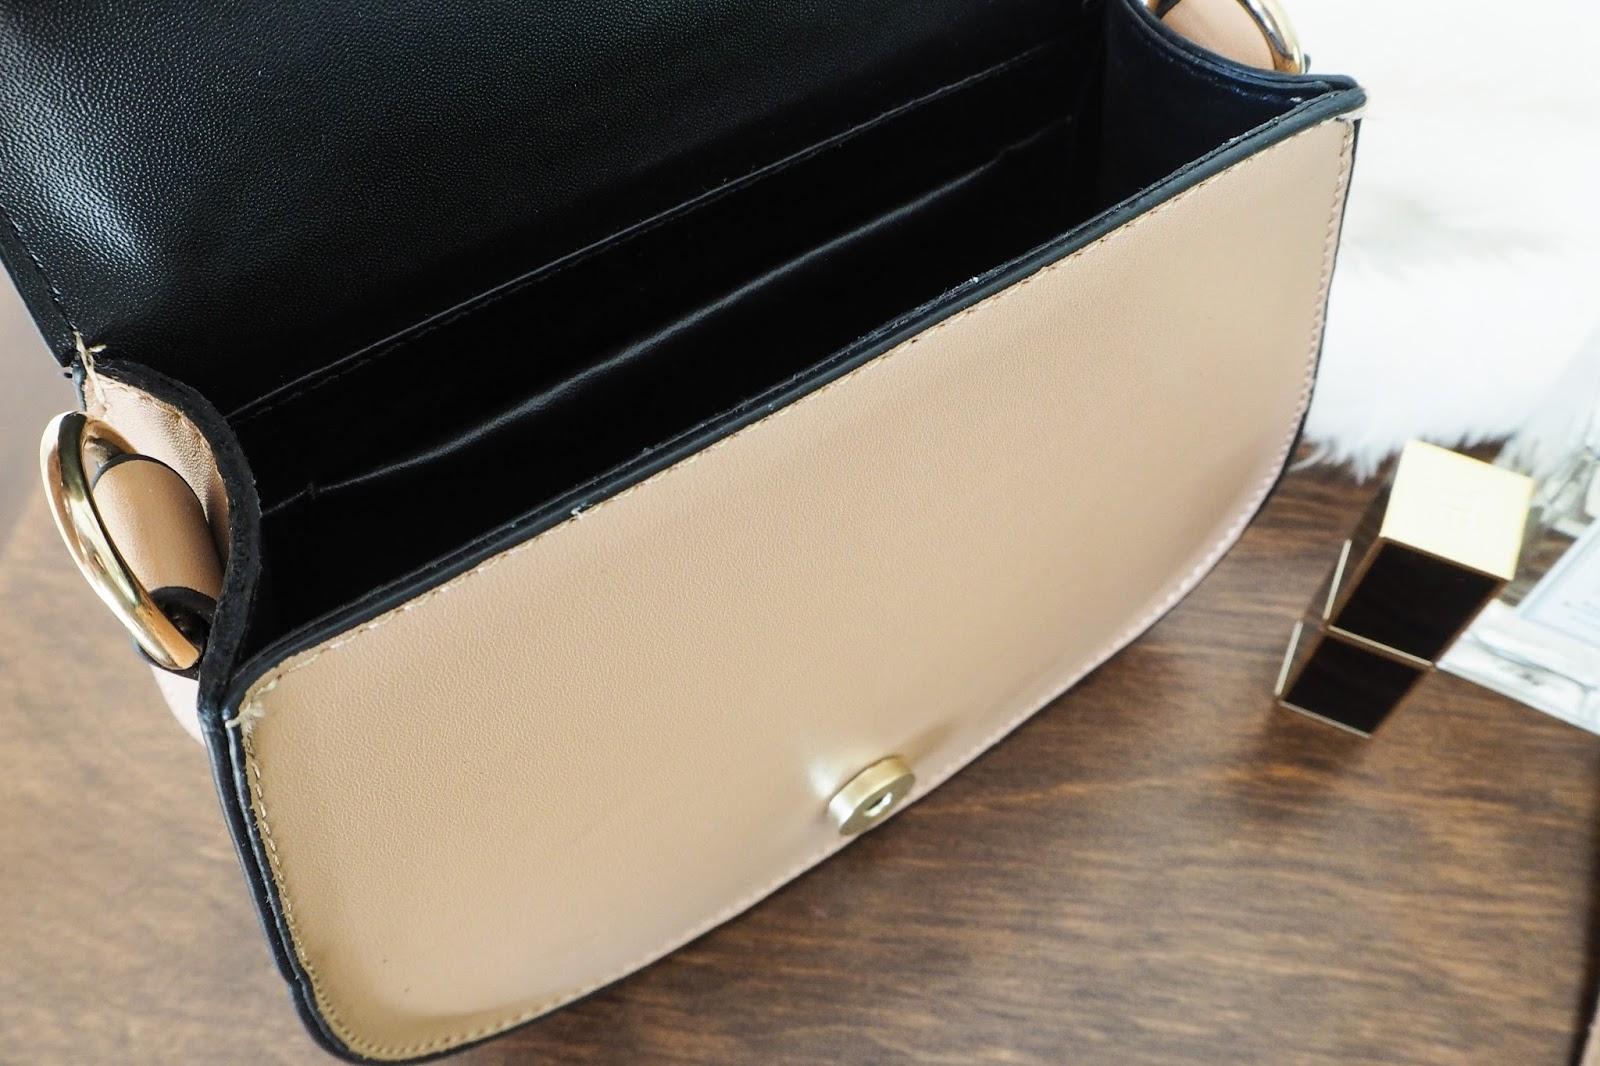 Inside the Chloe Nile dupe handbag